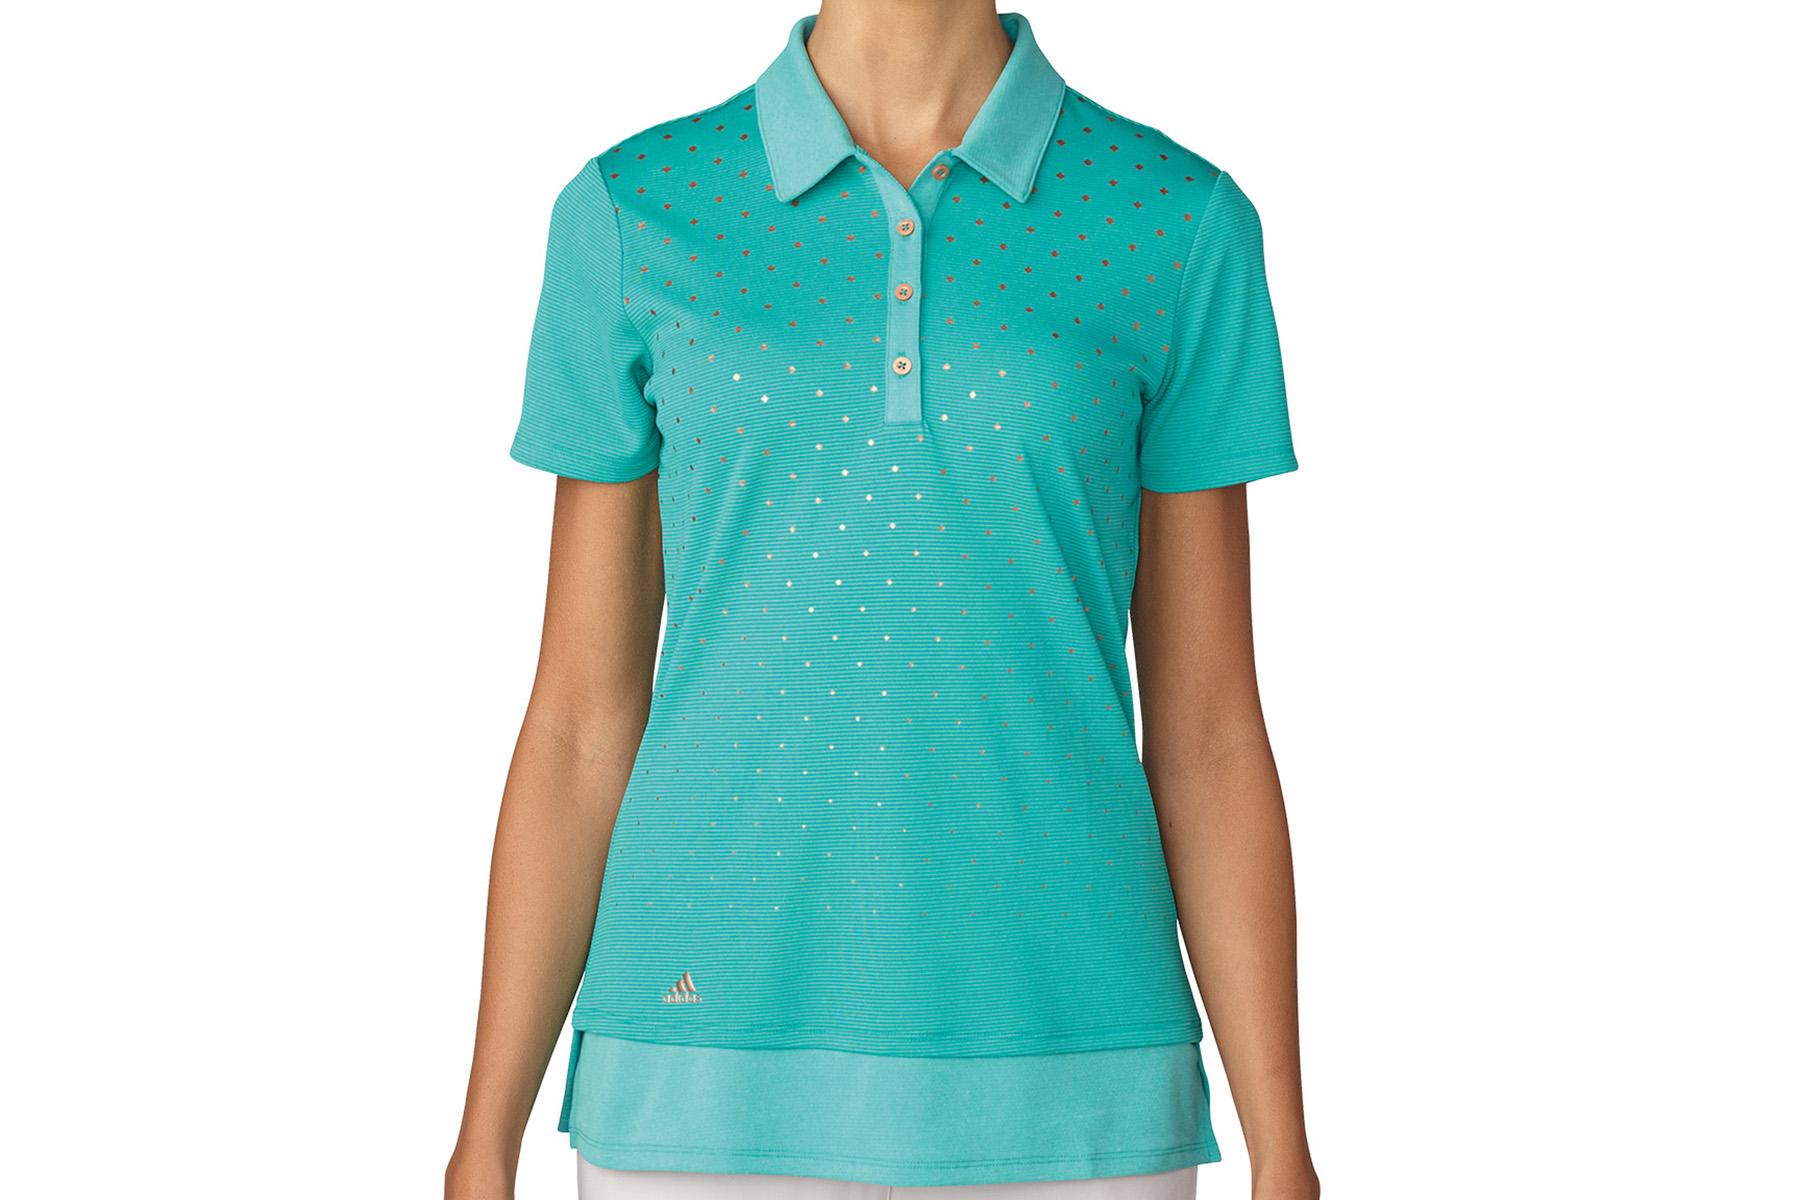 Adidas Golf Printed Ladies Polo Shirt From American Golf